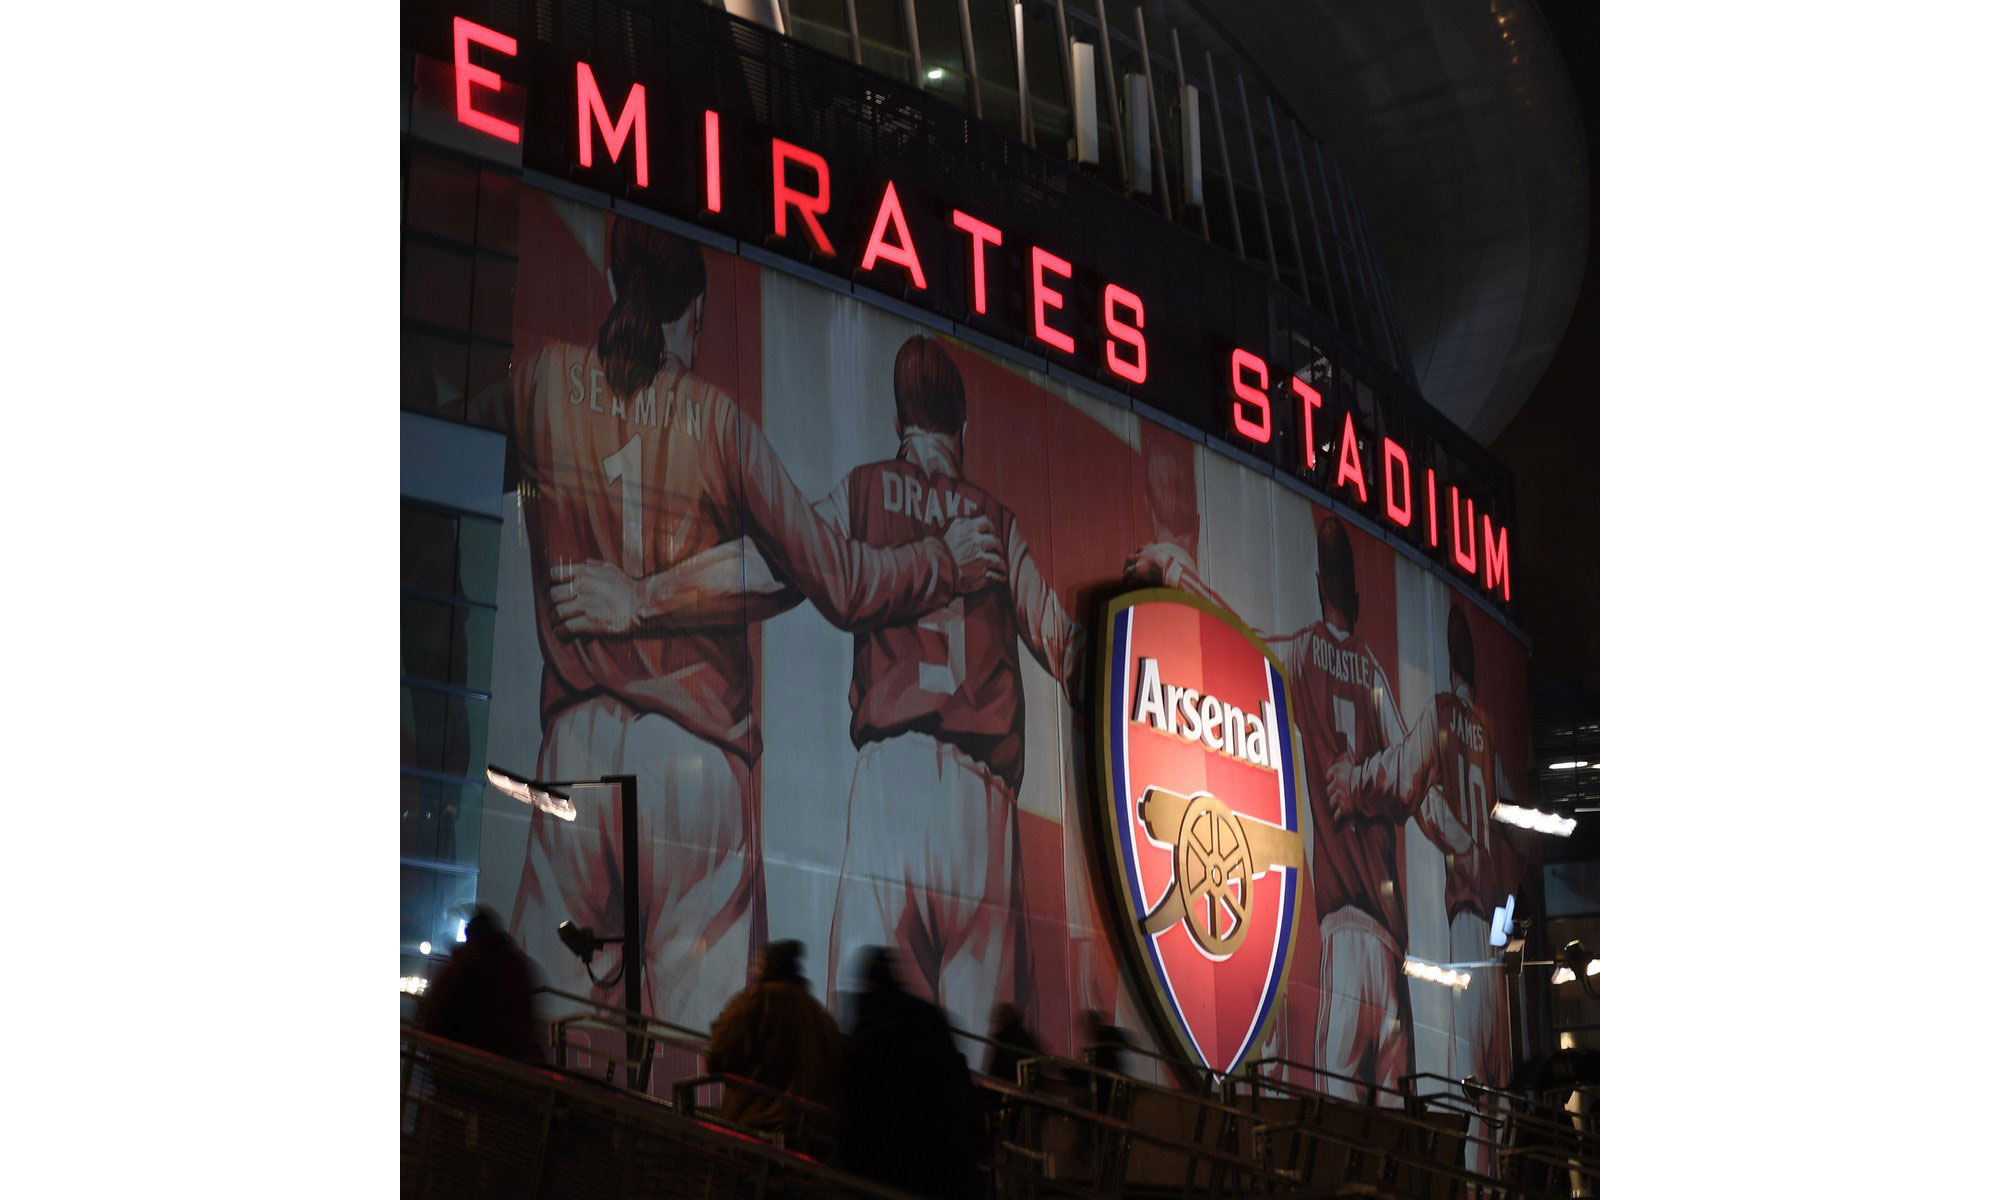 adidas 成为 Arsenal 足球俱乐部新的品牌赞助商